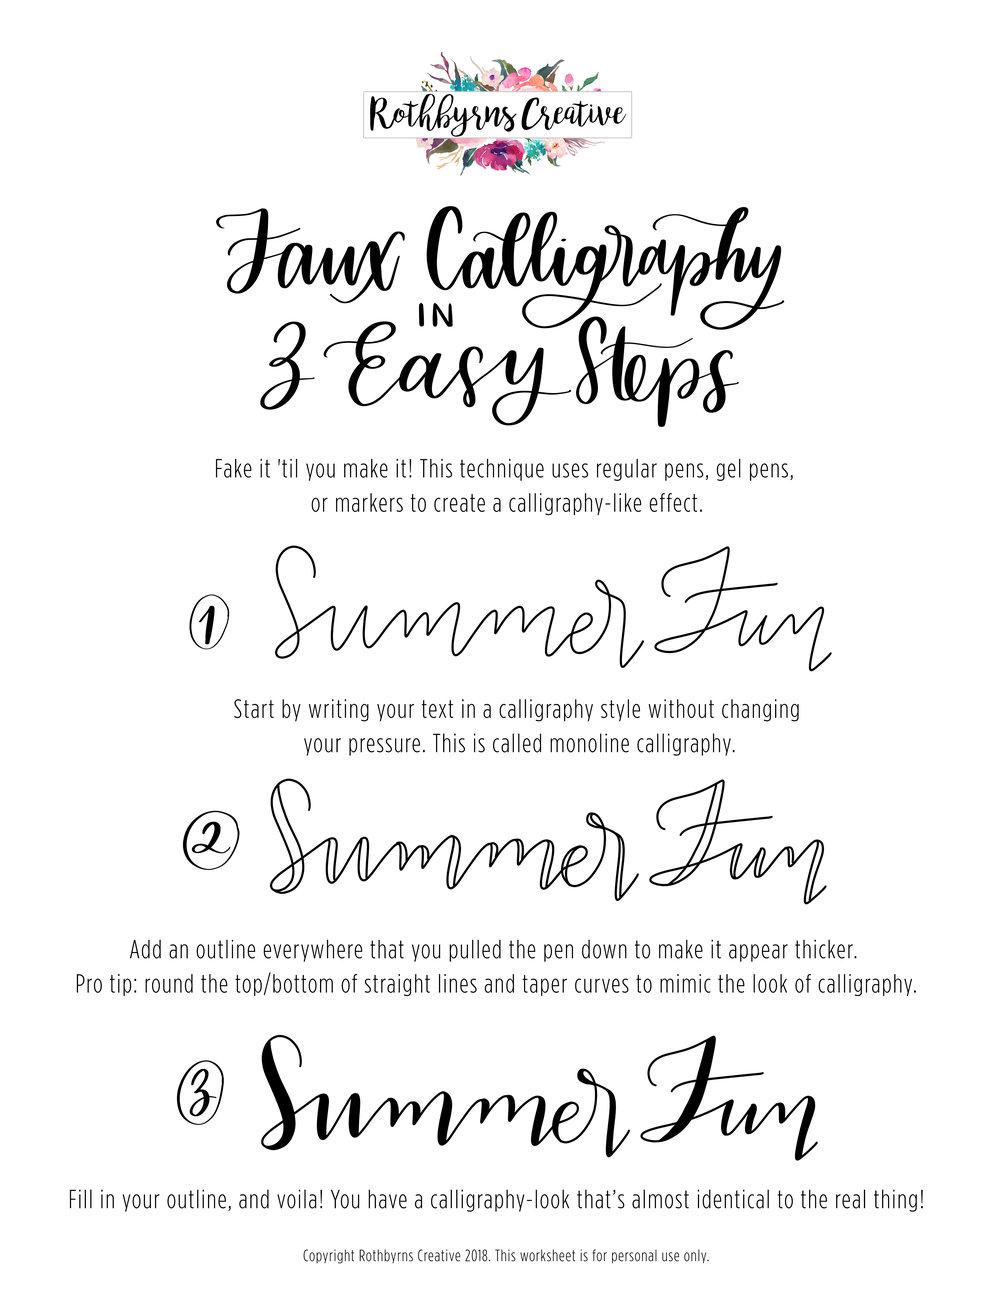 Summer Fun Faux Calligraphy.jpg